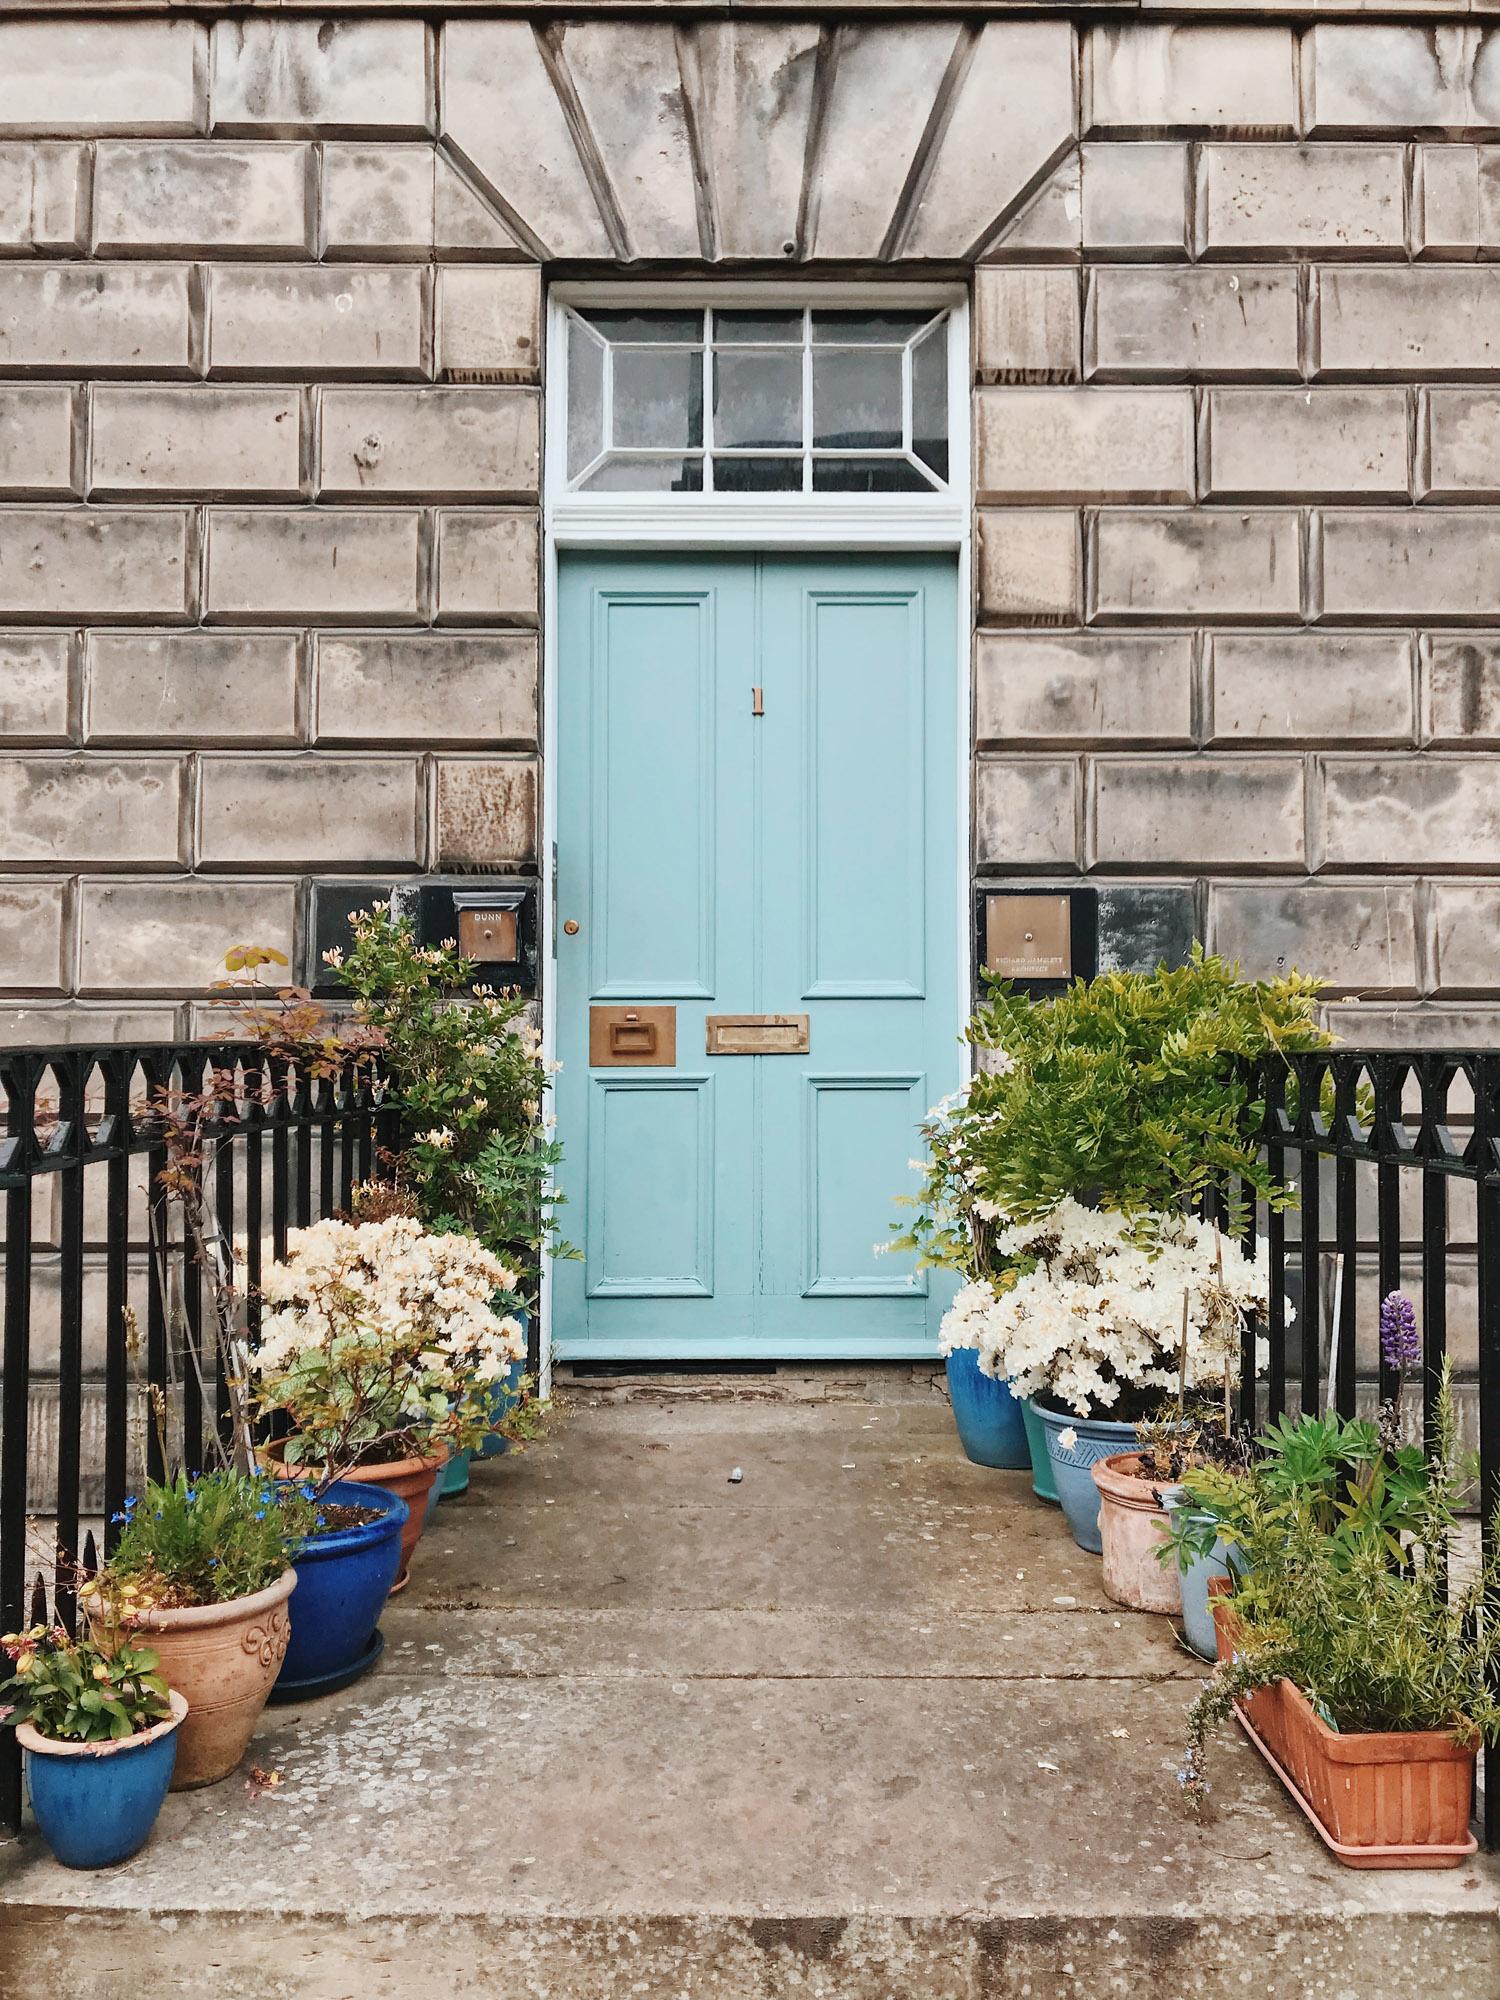 Colourful doors in Stockbridge